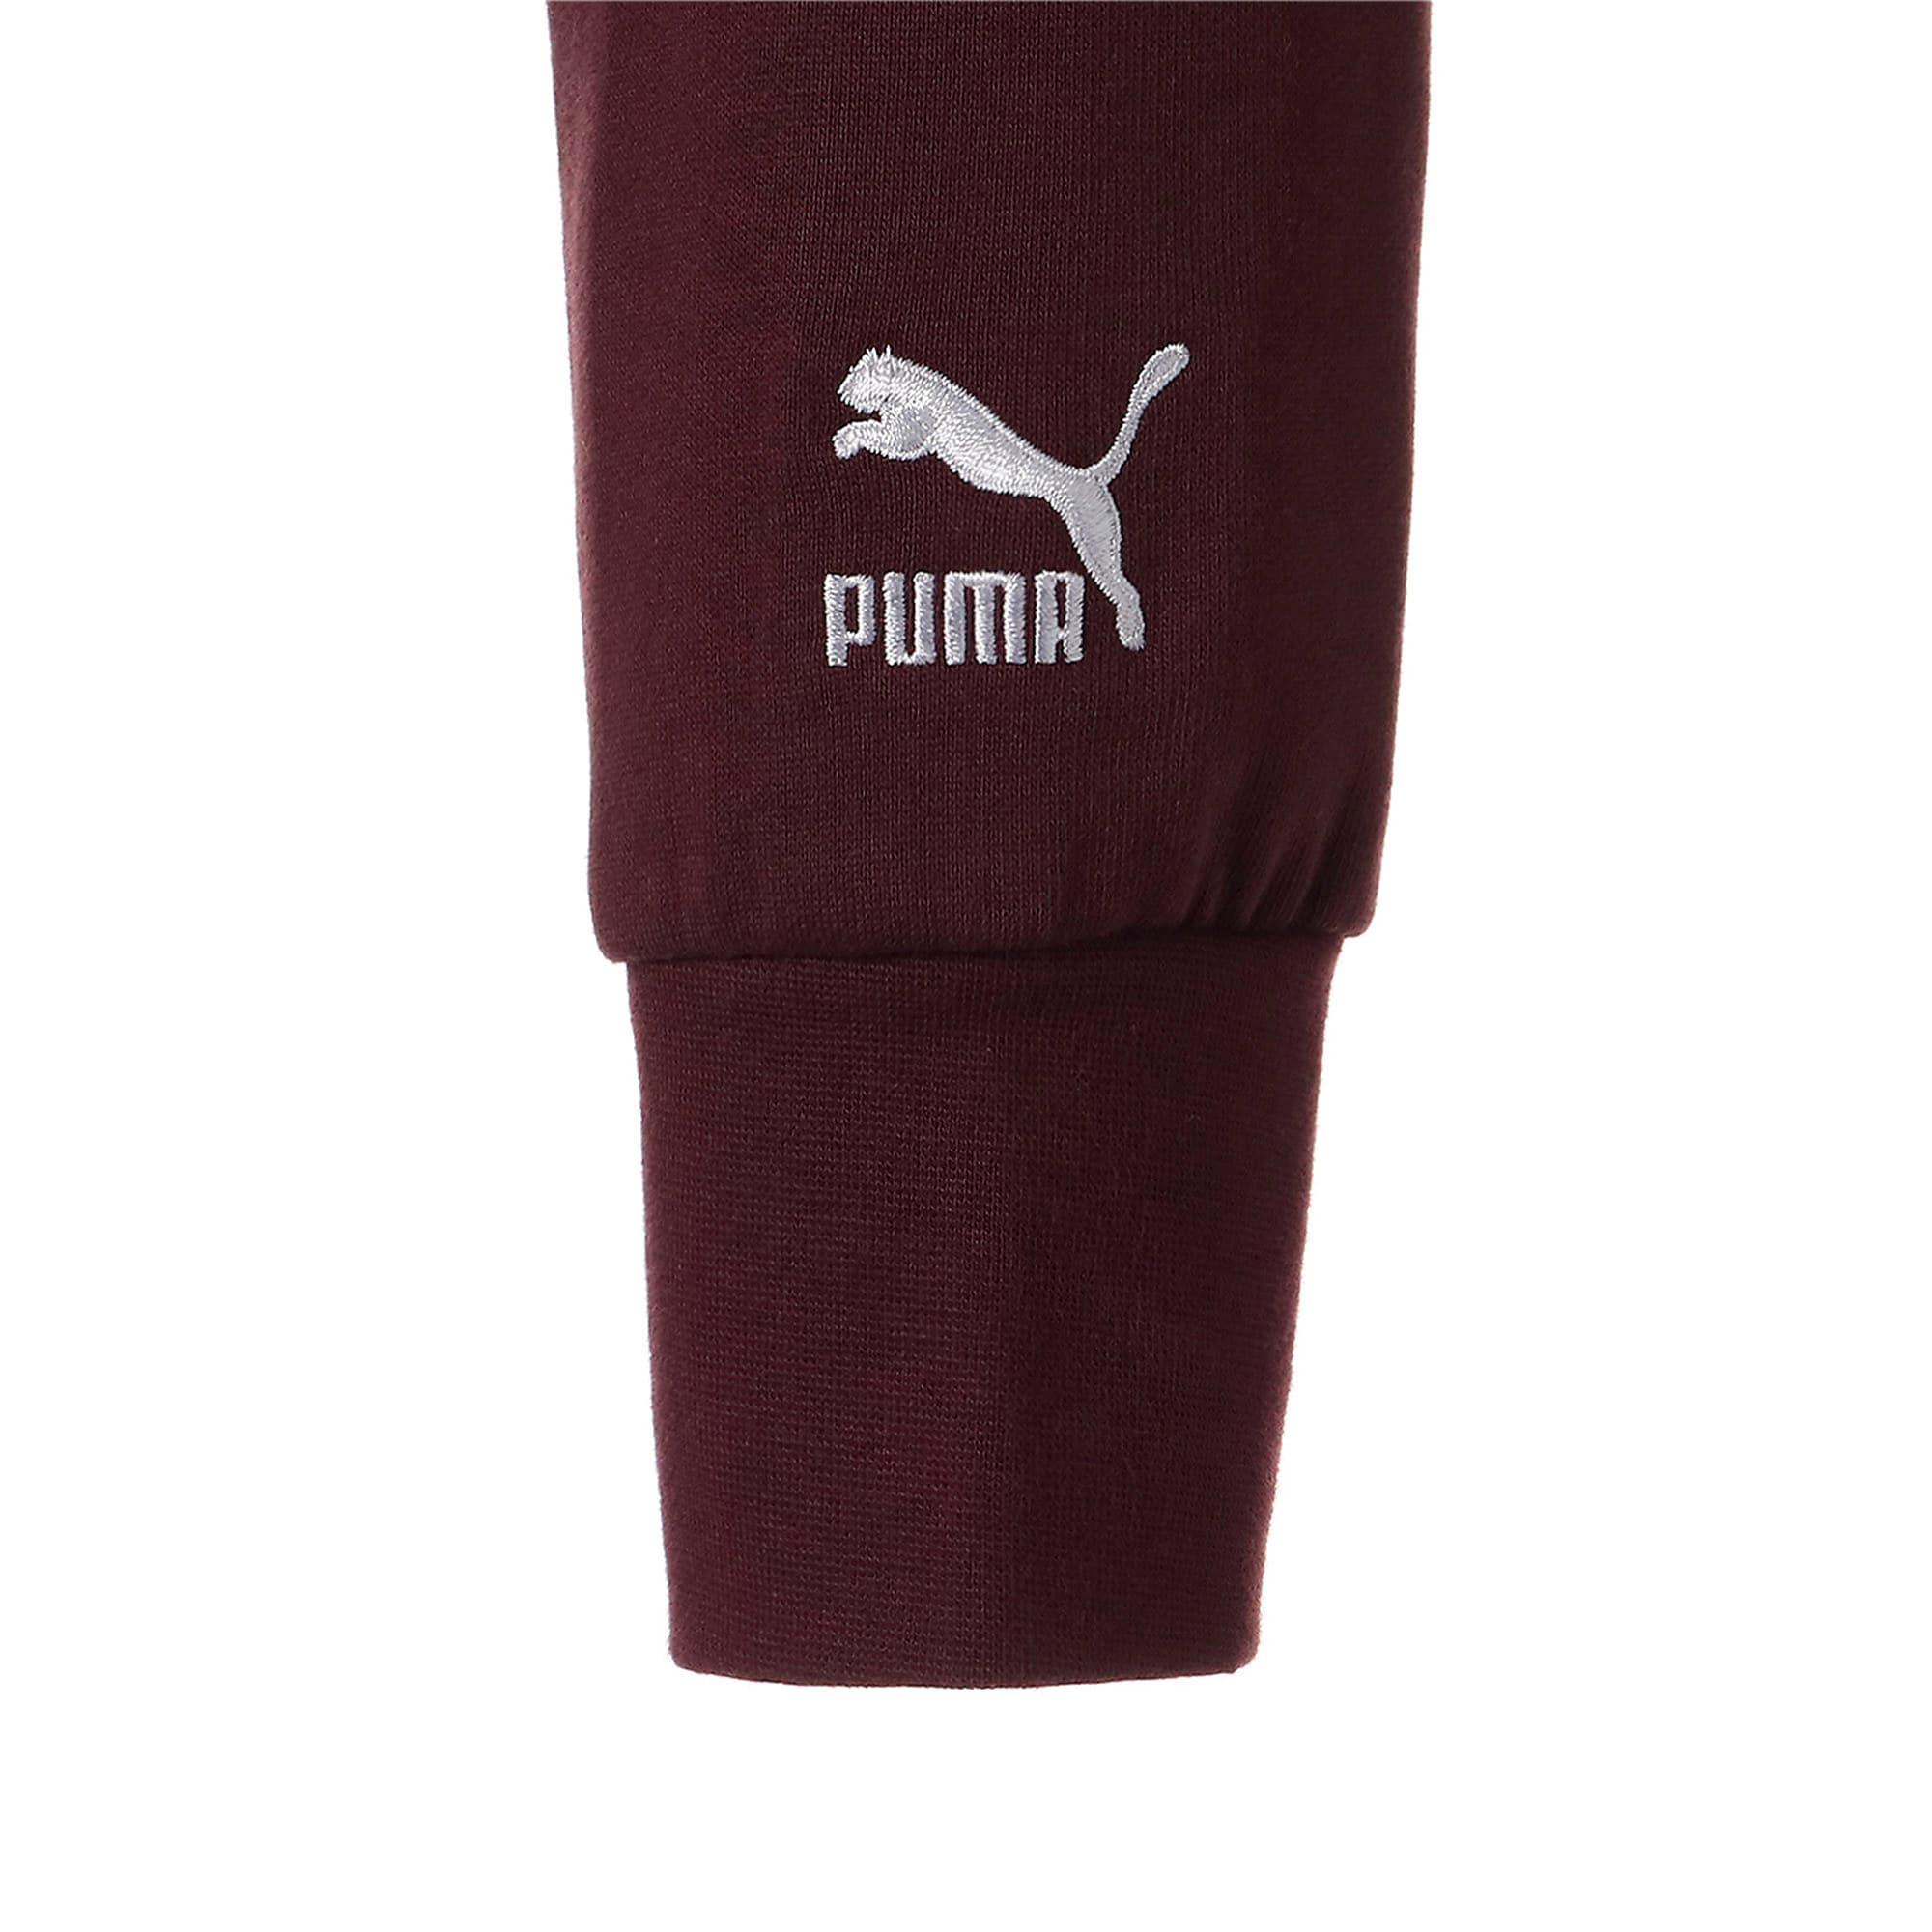 Thumbnail 5 of PUMA x TYAKASHA ウィメンズ タートルネック, Vineyard Wine, medium-JPN